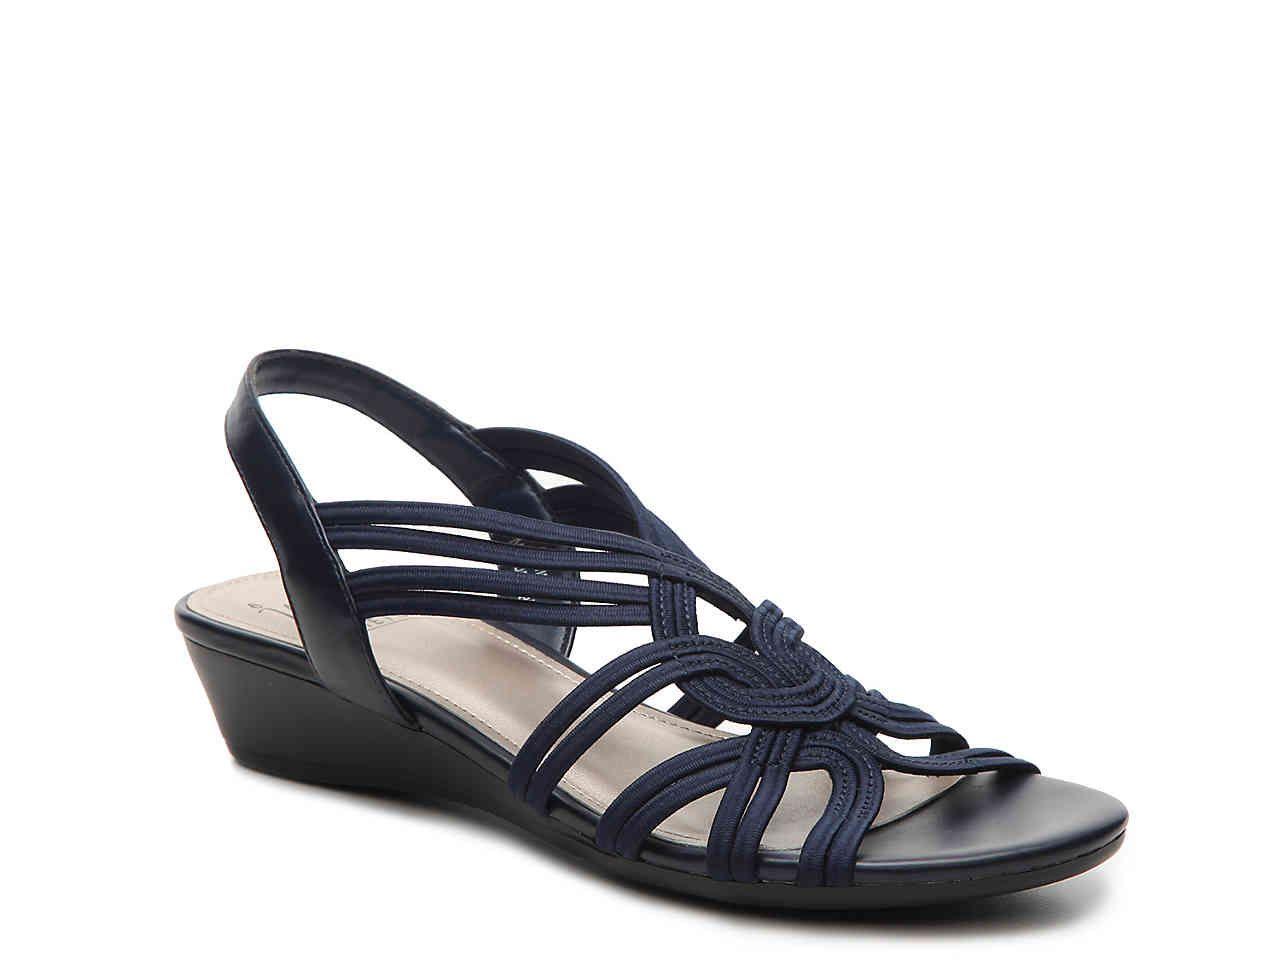 973f9caadfea7 Shoes